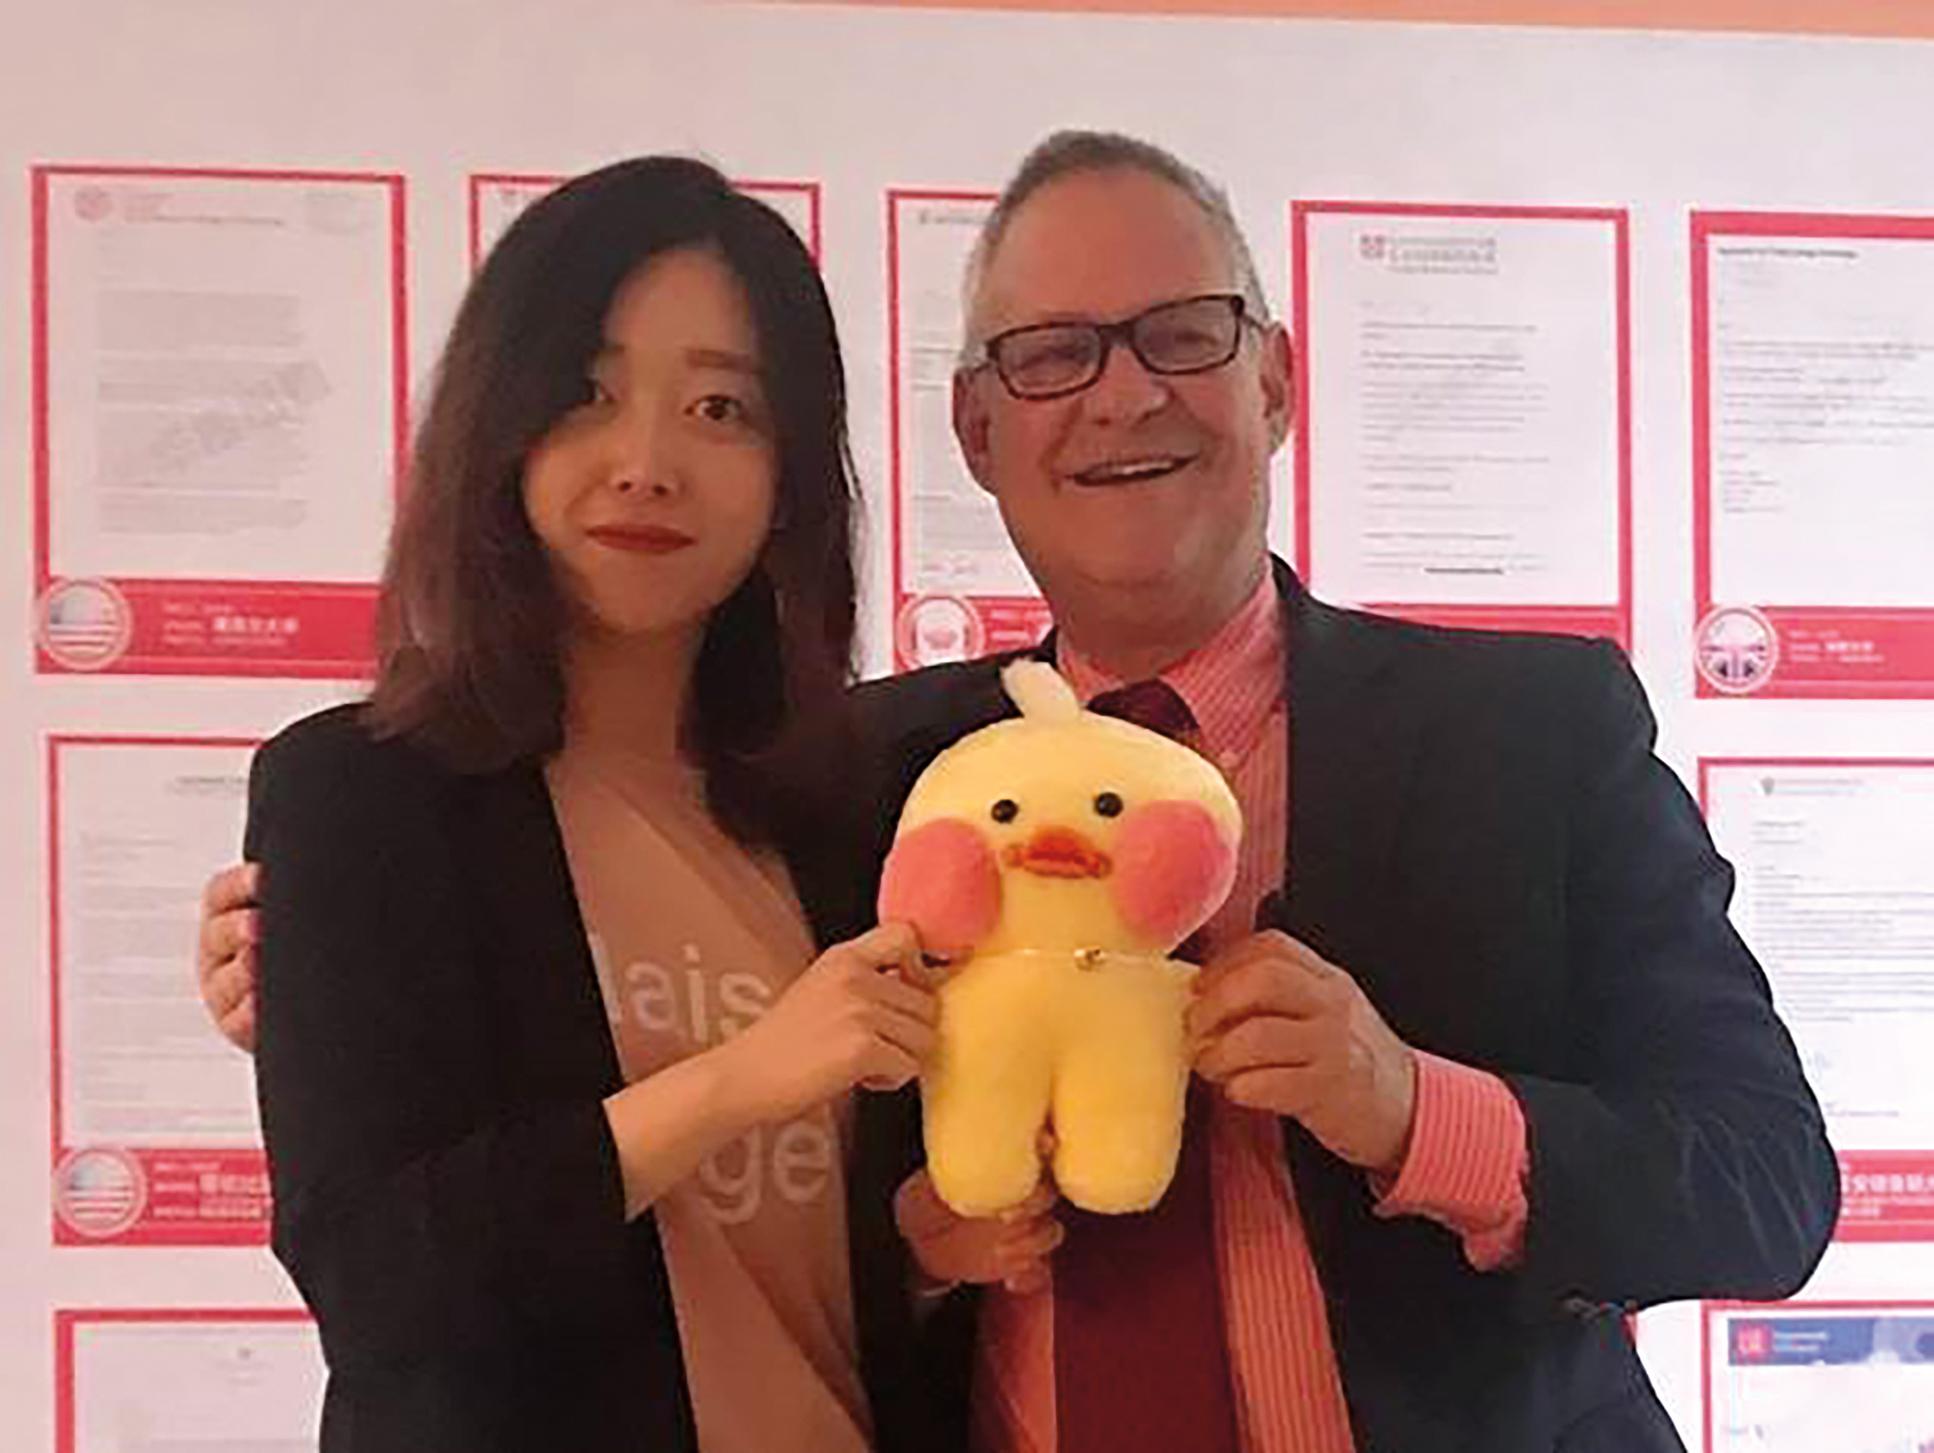 Lin Giralt '72 promoting school programs in China.